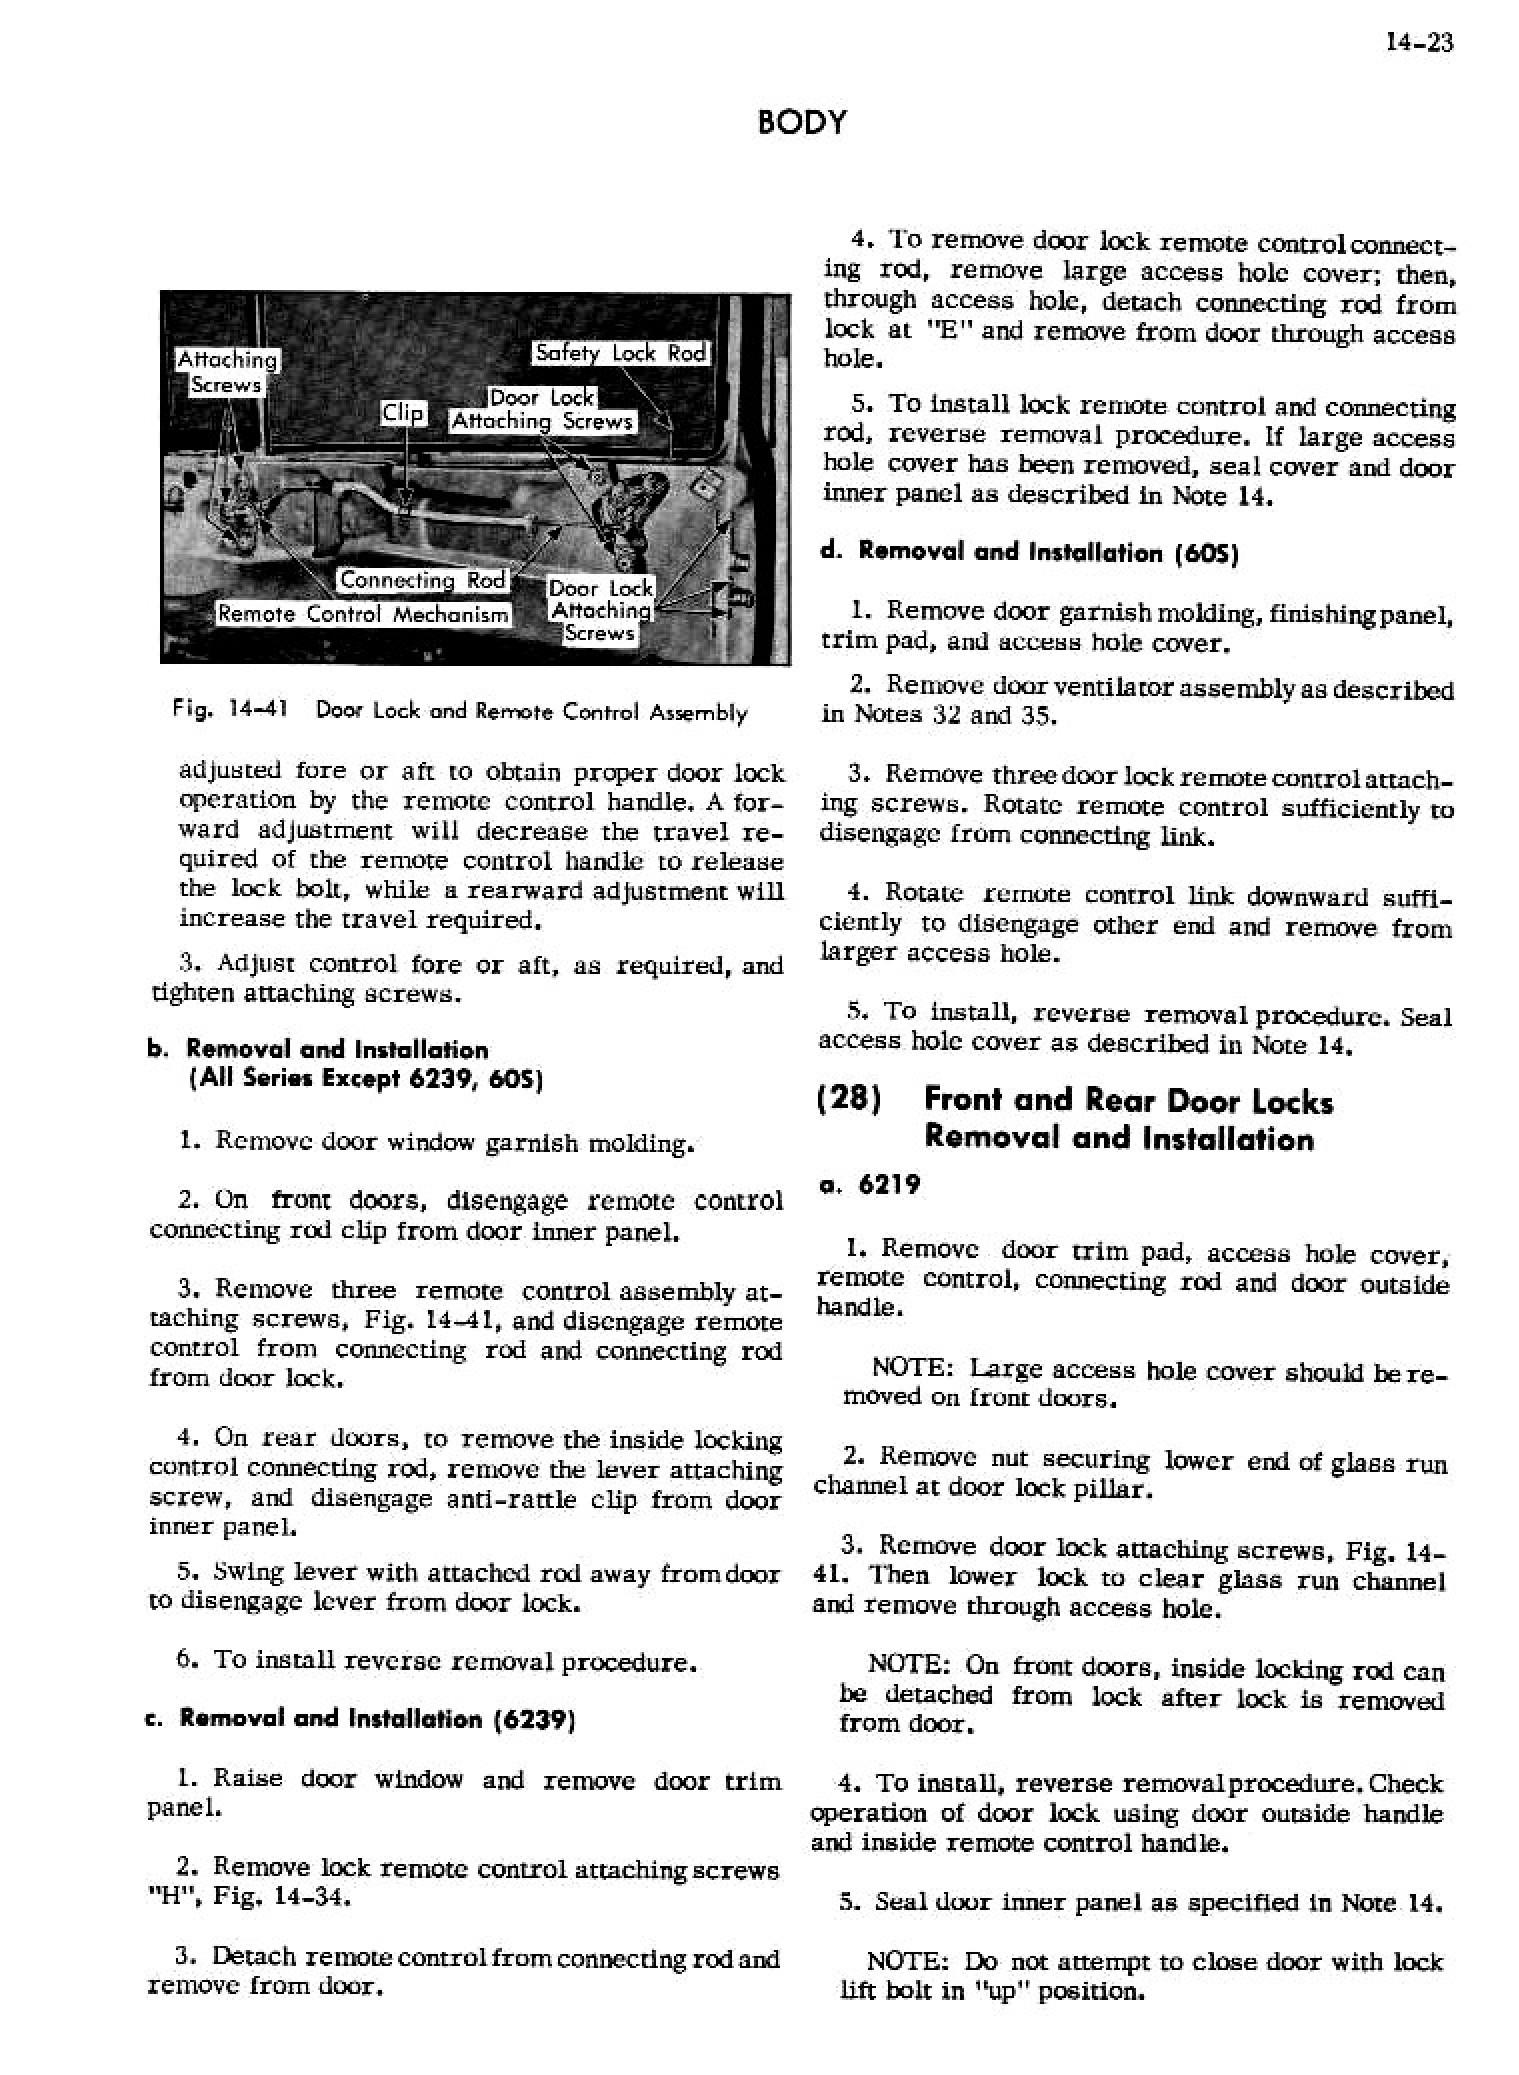 1956 Cadillac Shop Manual- Body Page 23 of 87